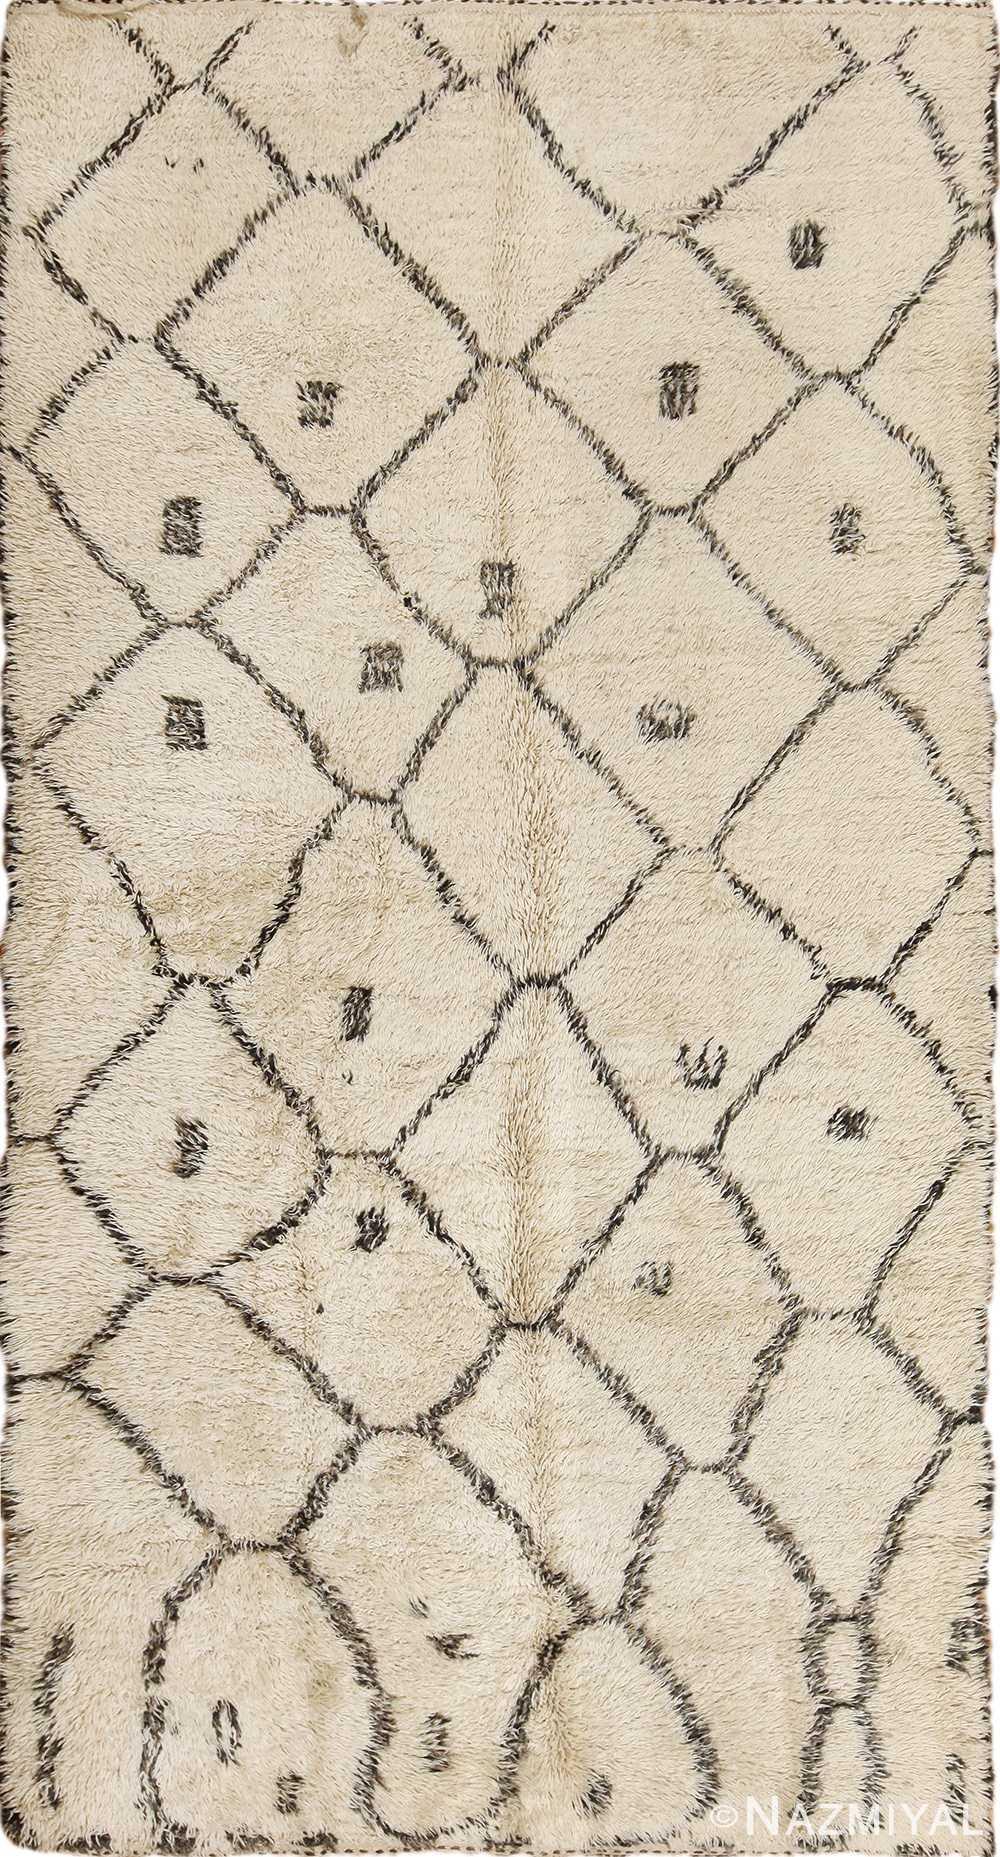 Ivory Shag Pile Vintage Beni Ourain Moroccan Rug 49875 - Nazmiyal